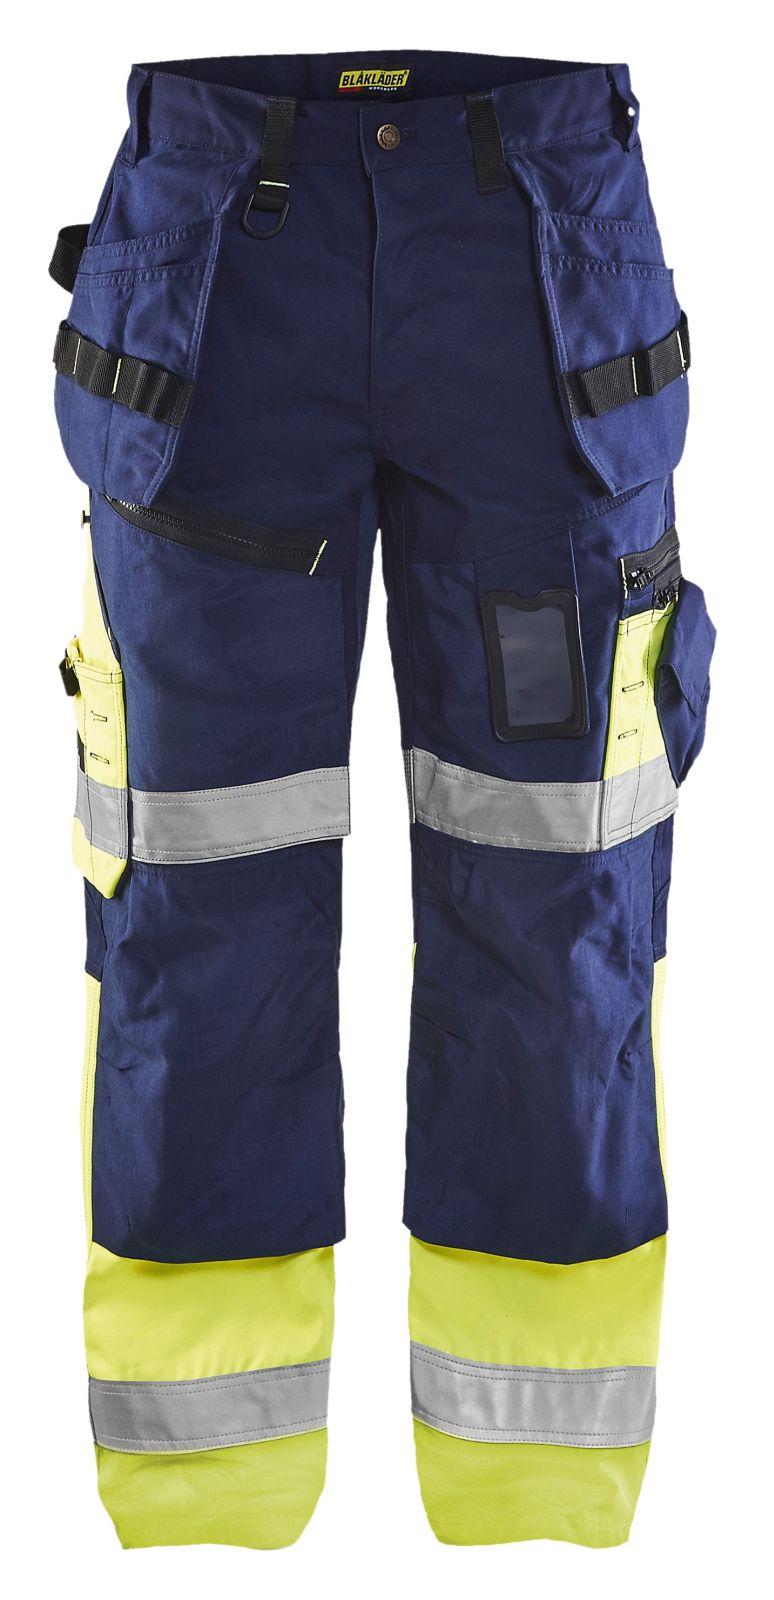 Blaklader Werkbroeken 15081860 High Vis marineblauw-geel(8933)